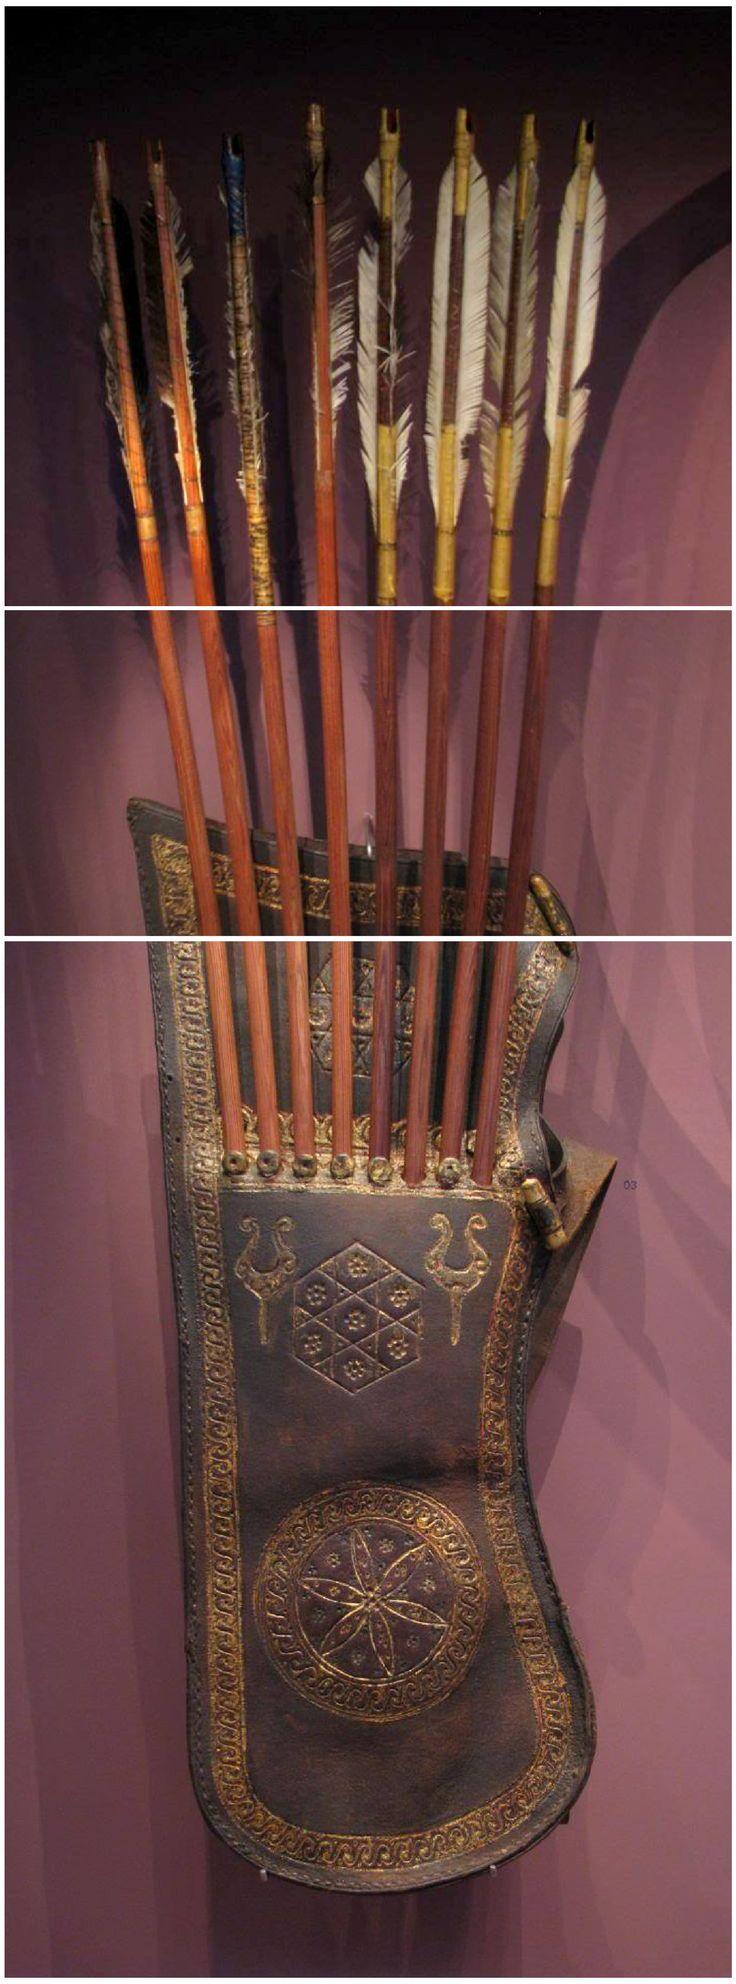 17. yüzyıl Osmanlı tirkeş ve oklar, Nürnberg, Almanya 17th century Ottoman quiver and arrows, Nürnberg, Germany